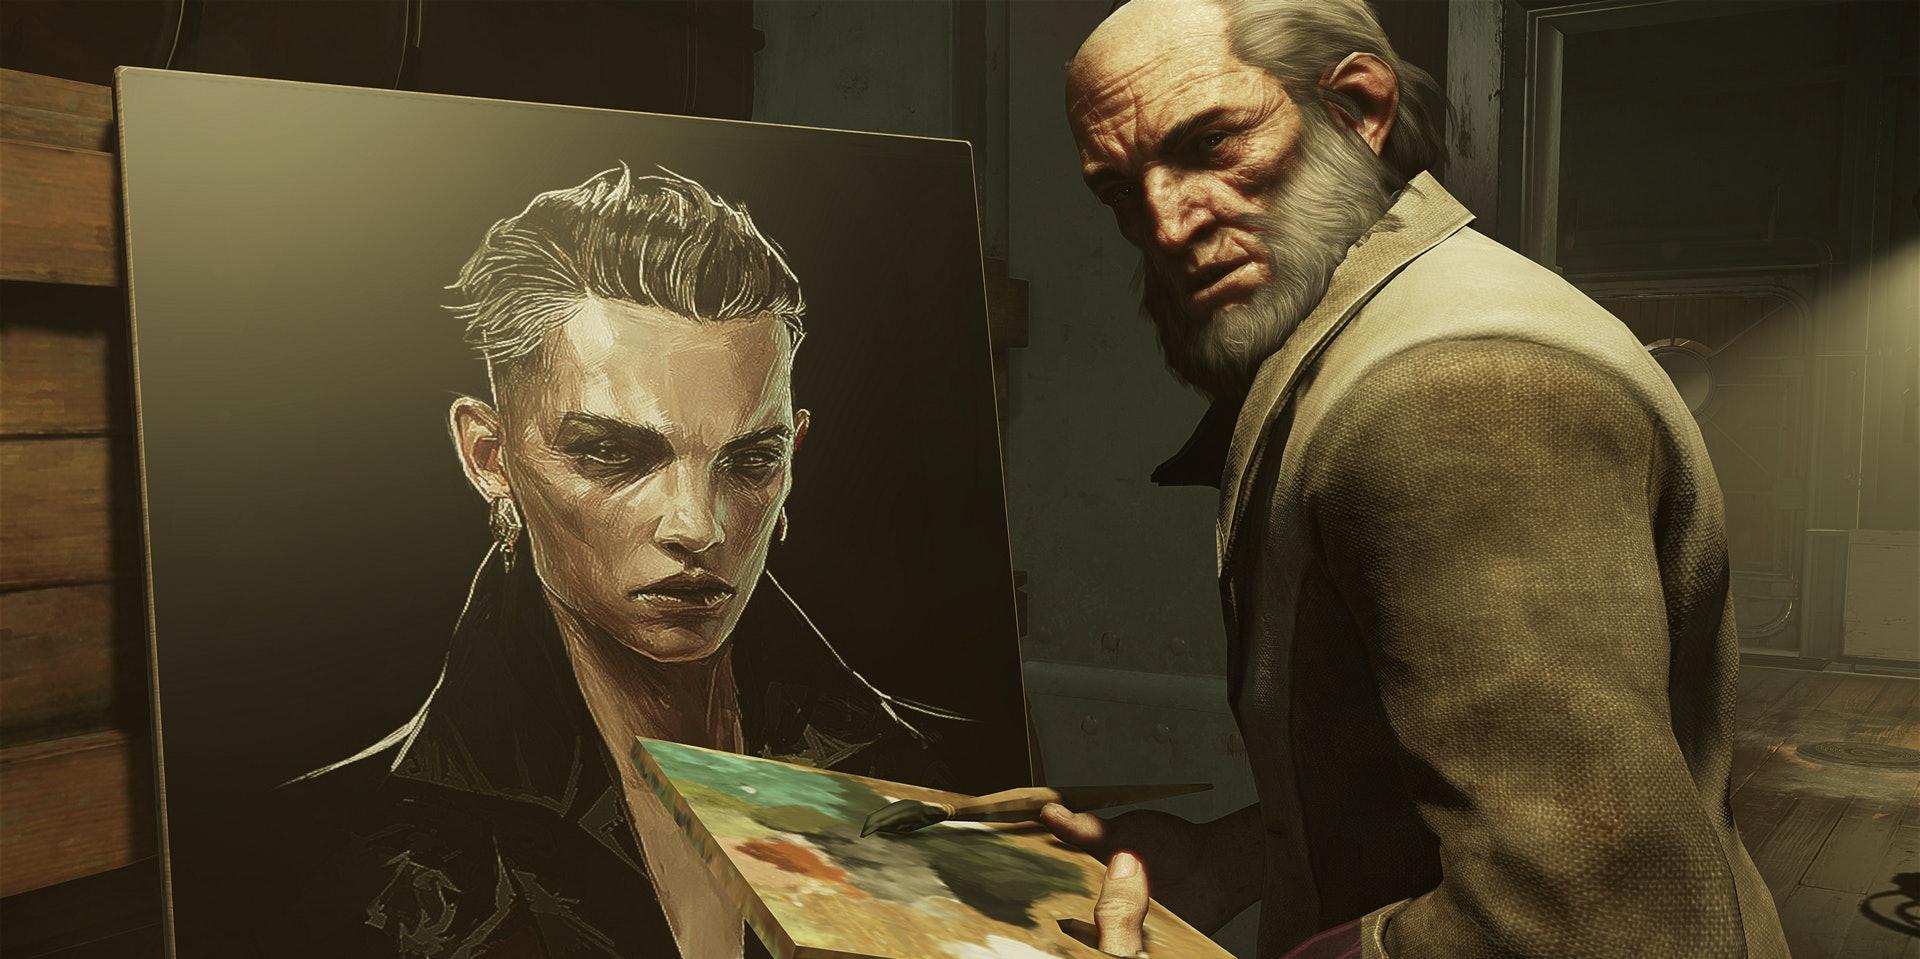 This is Anton Sokolov, seen here painting the usurper, Delilah.